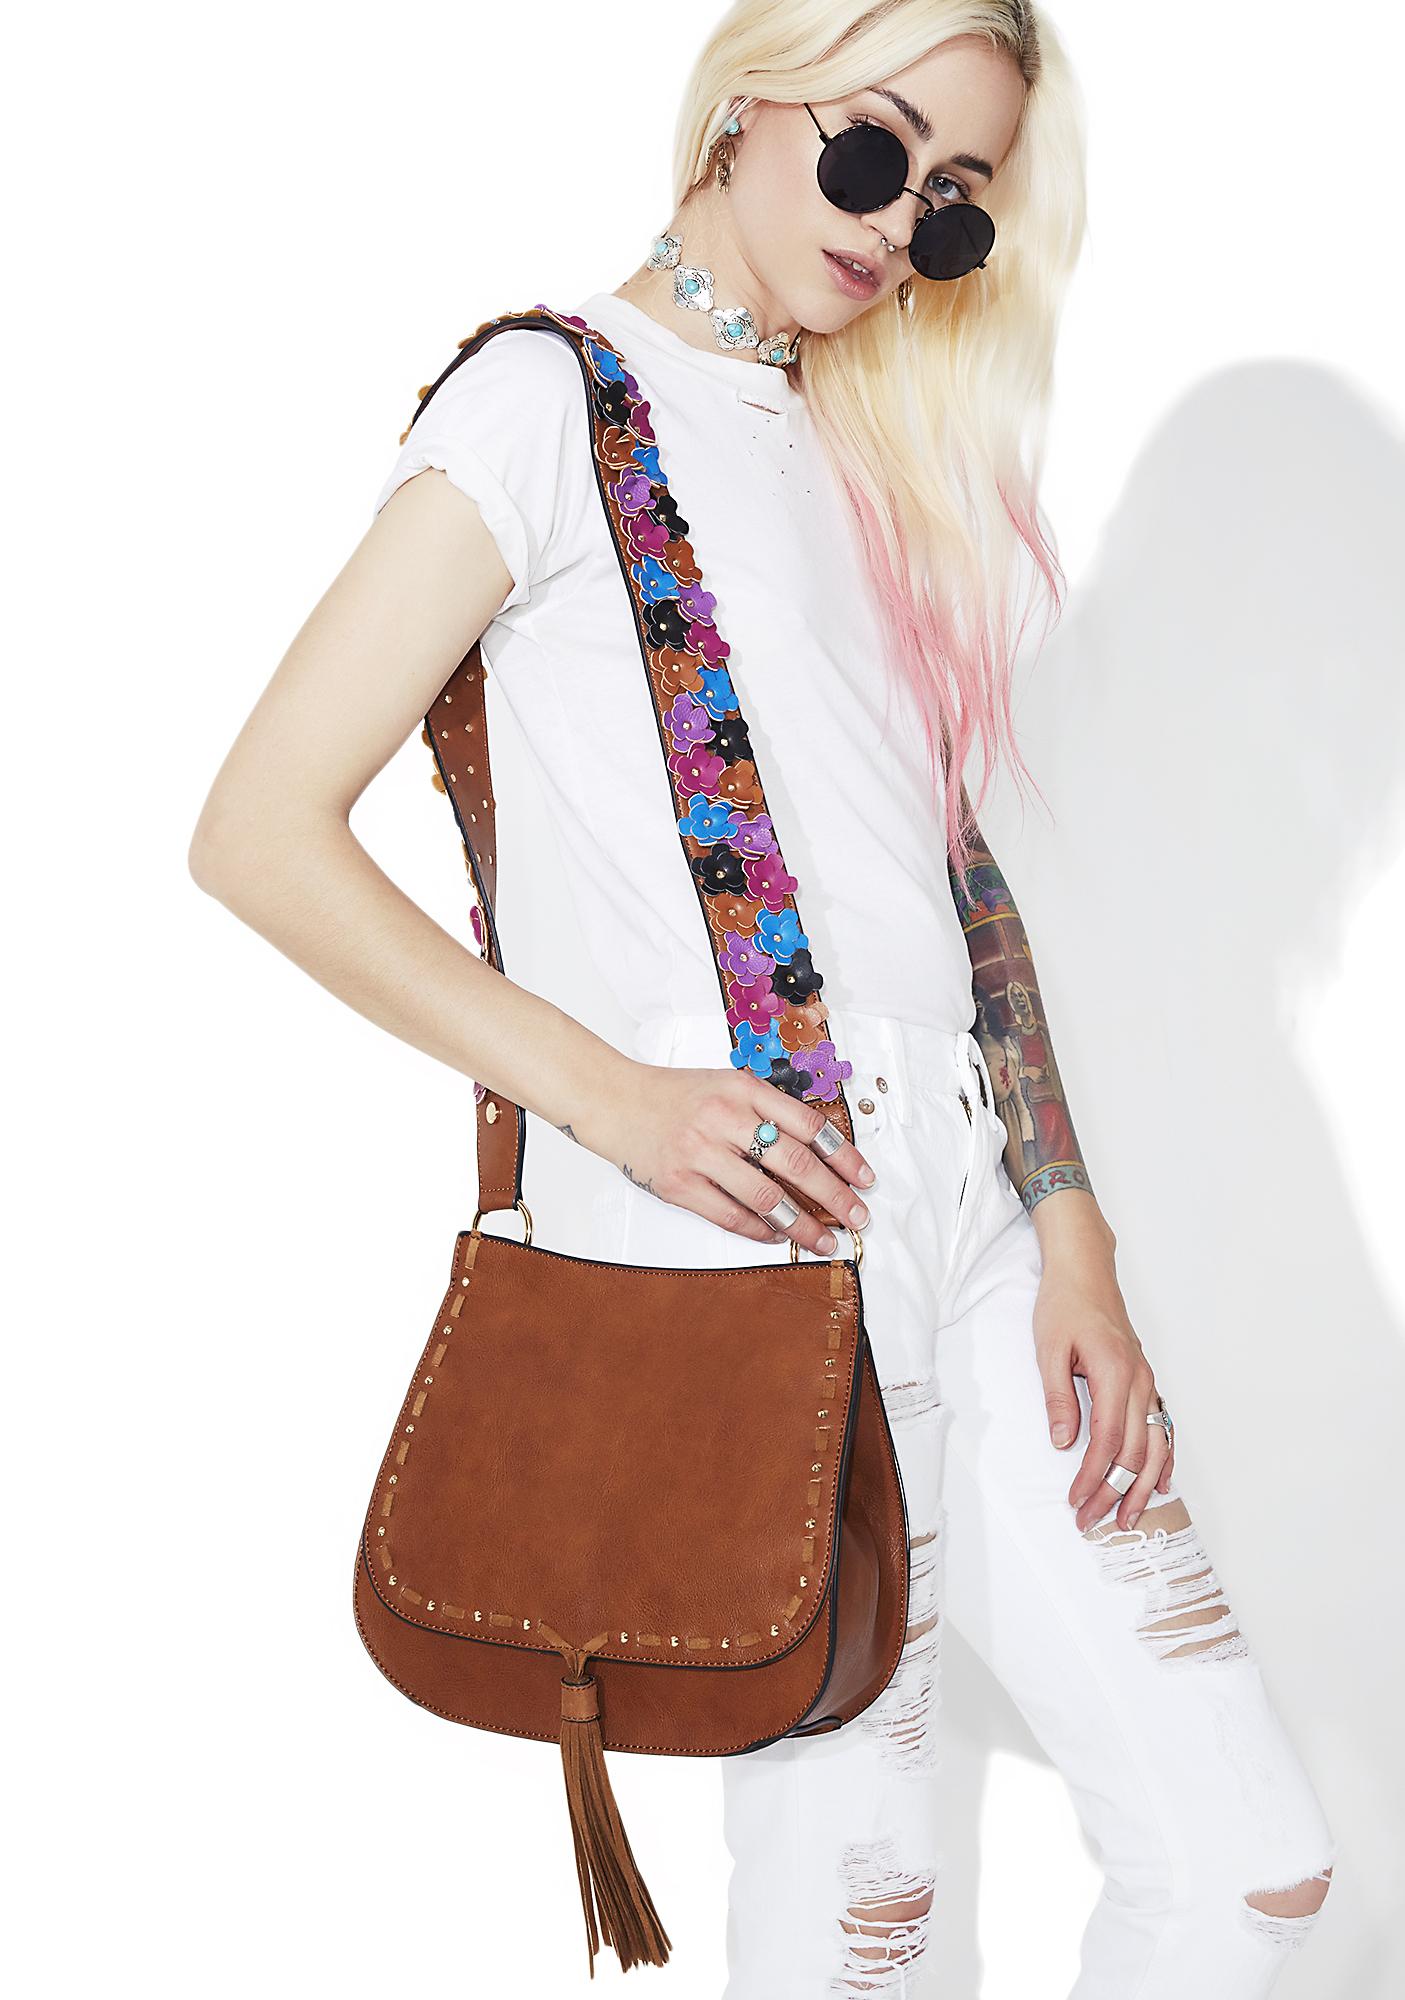 Steve Madden Selena Floral Crossbody Bag